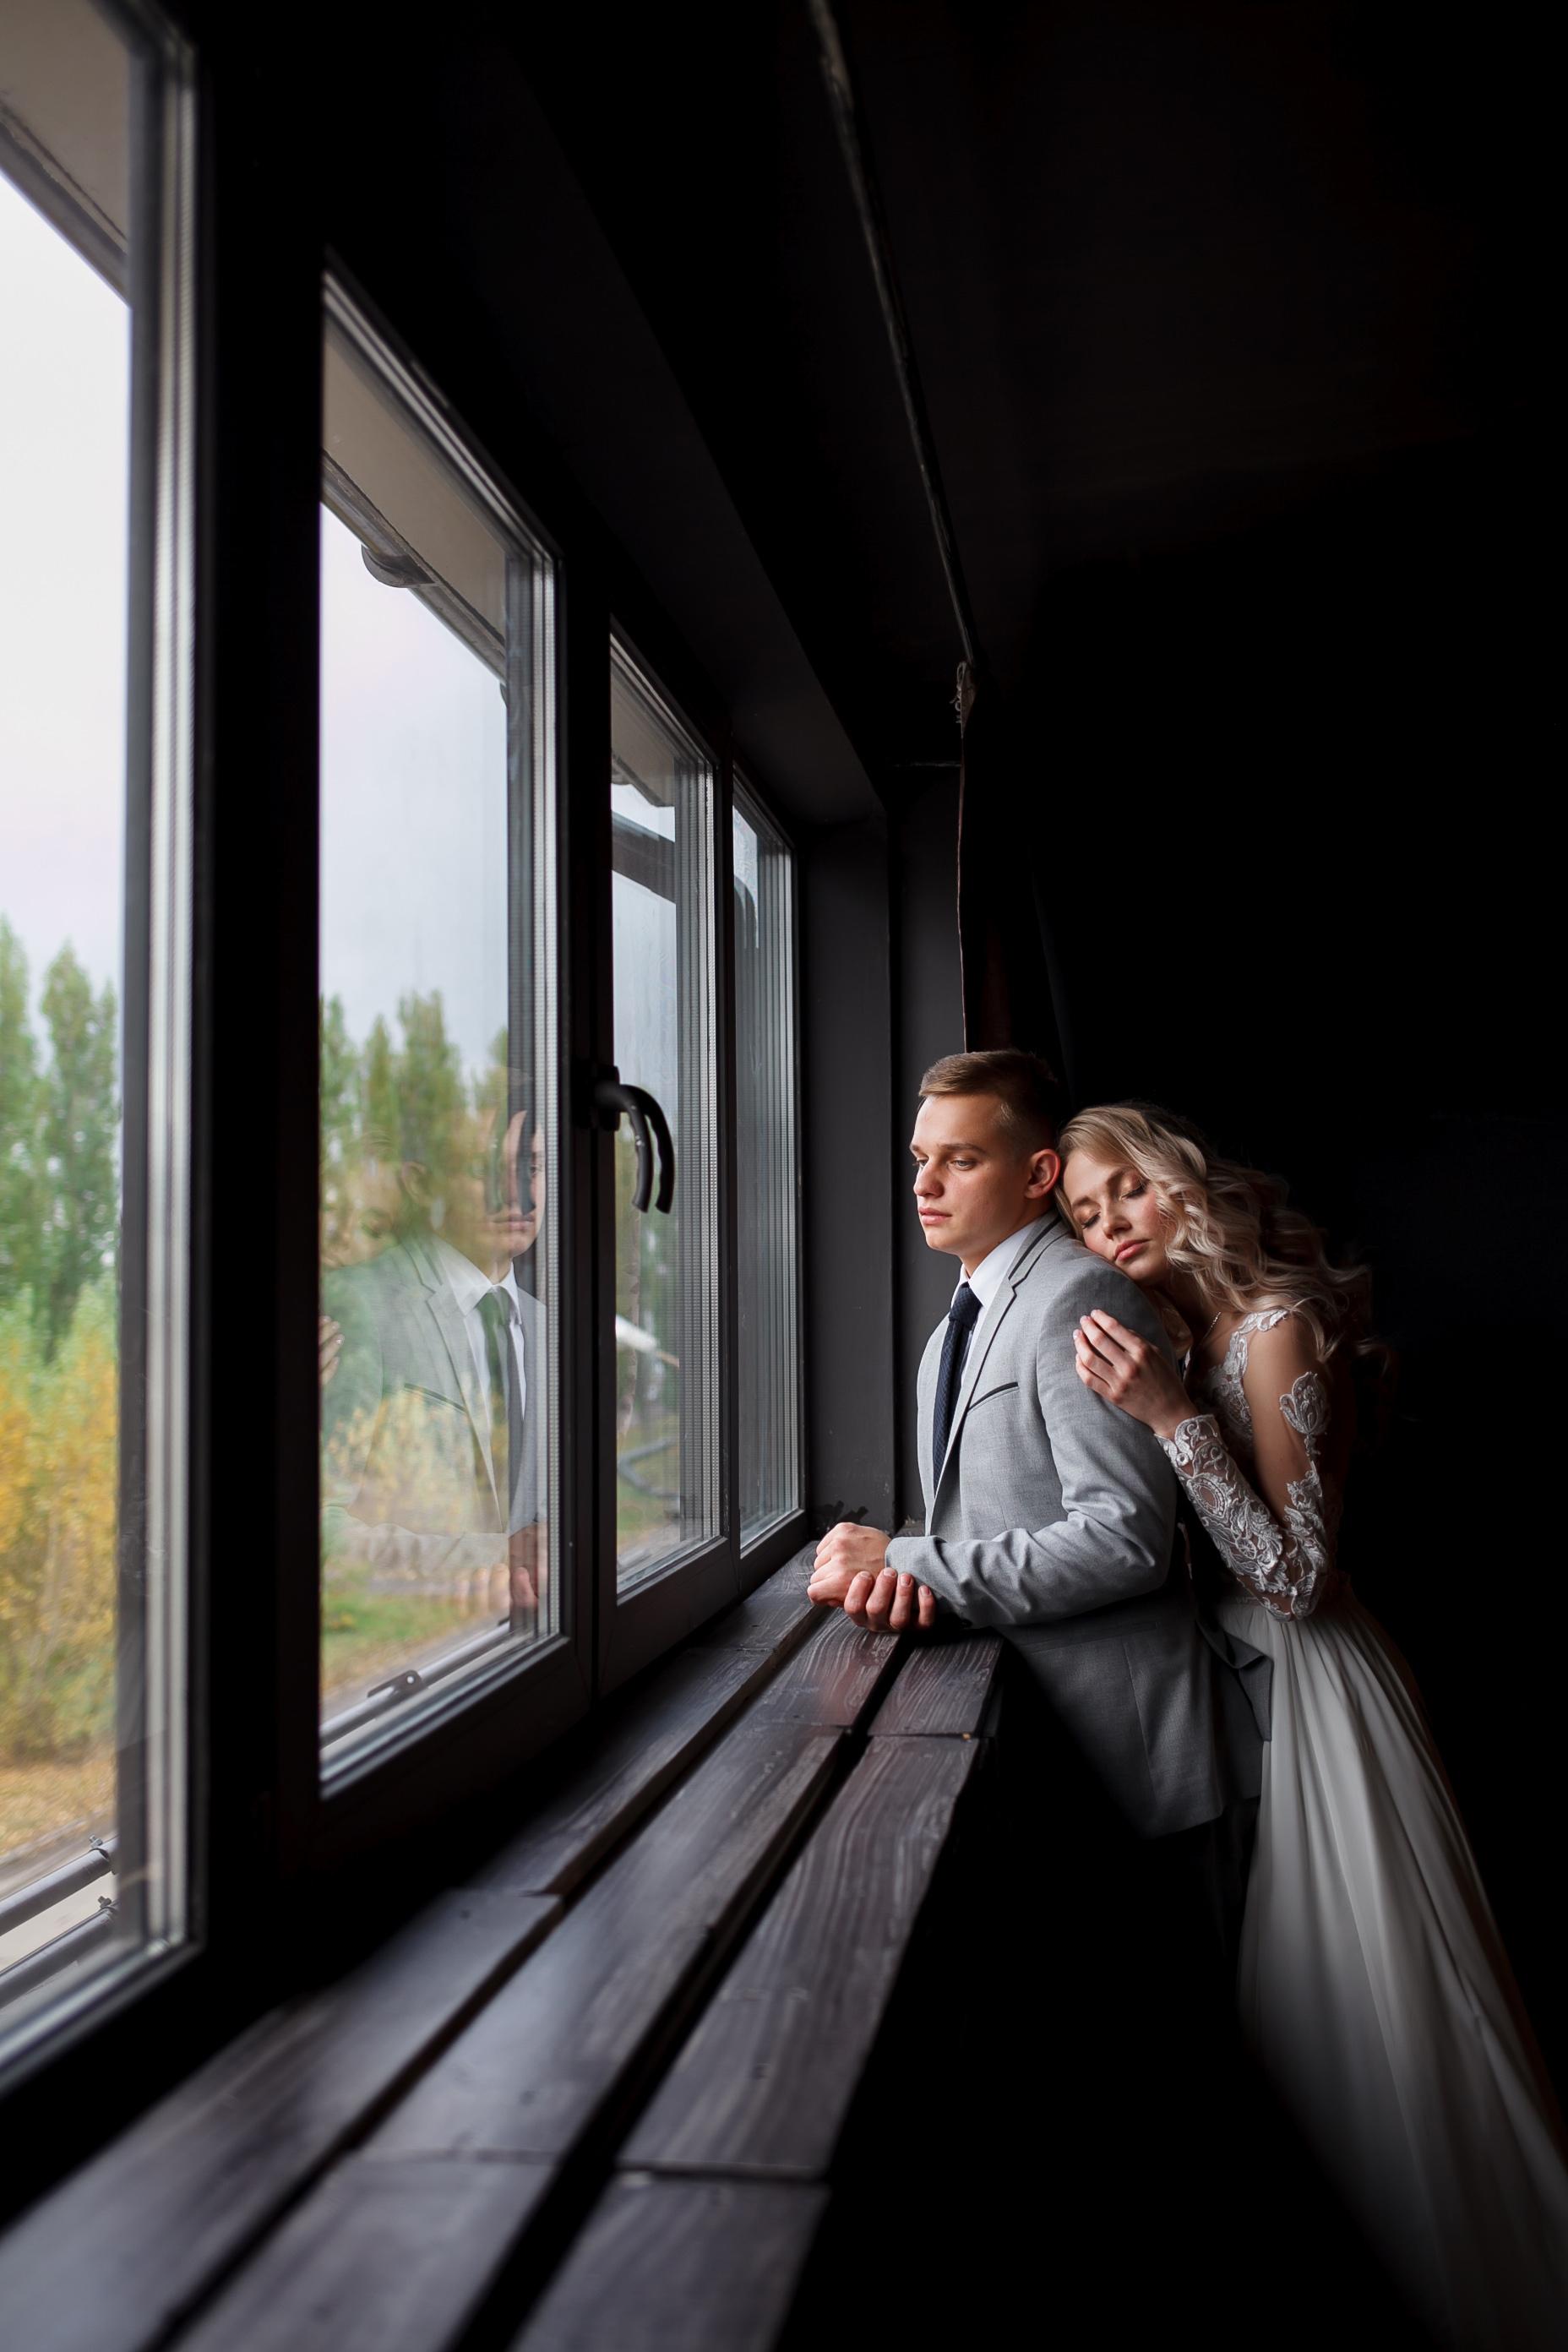 Ксения Мартюшева в Нижнем Новгороде